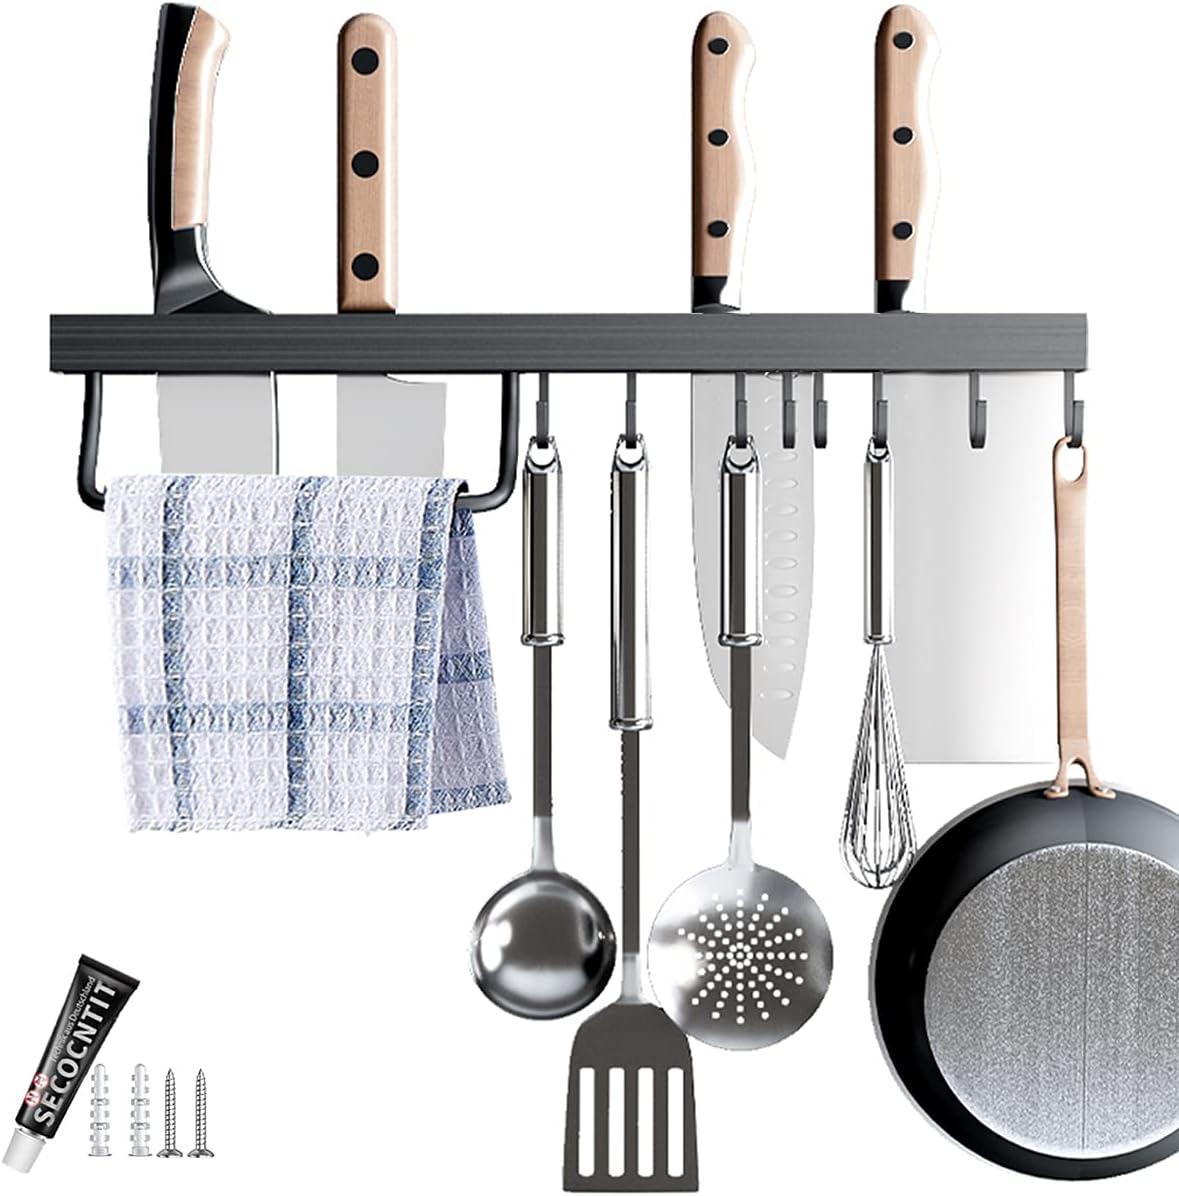 Utensil Racks 16 Inch Kitchen Hanging 2 with Holder Rack Knife Spasm price 5 ☆ popular